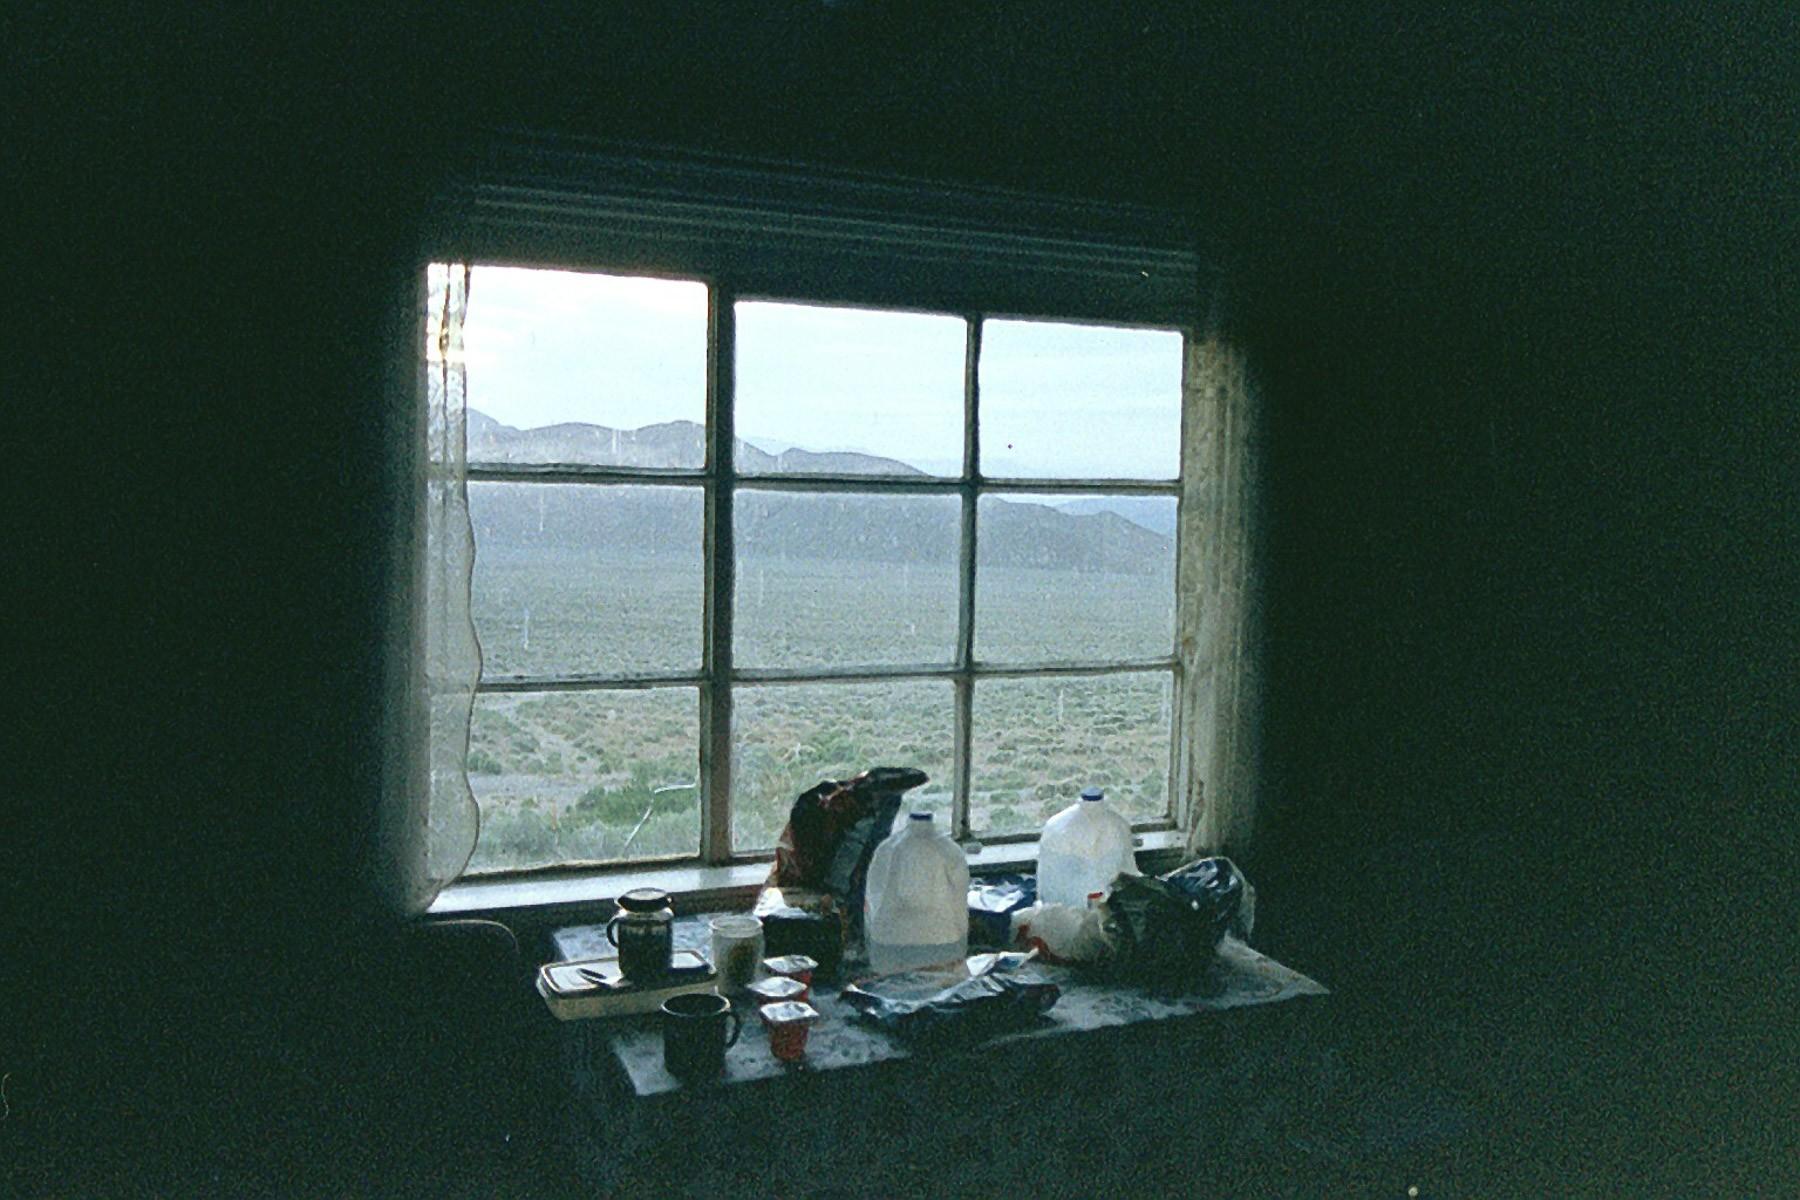 717D.V.-139-Canon-A1 Storie di Luce